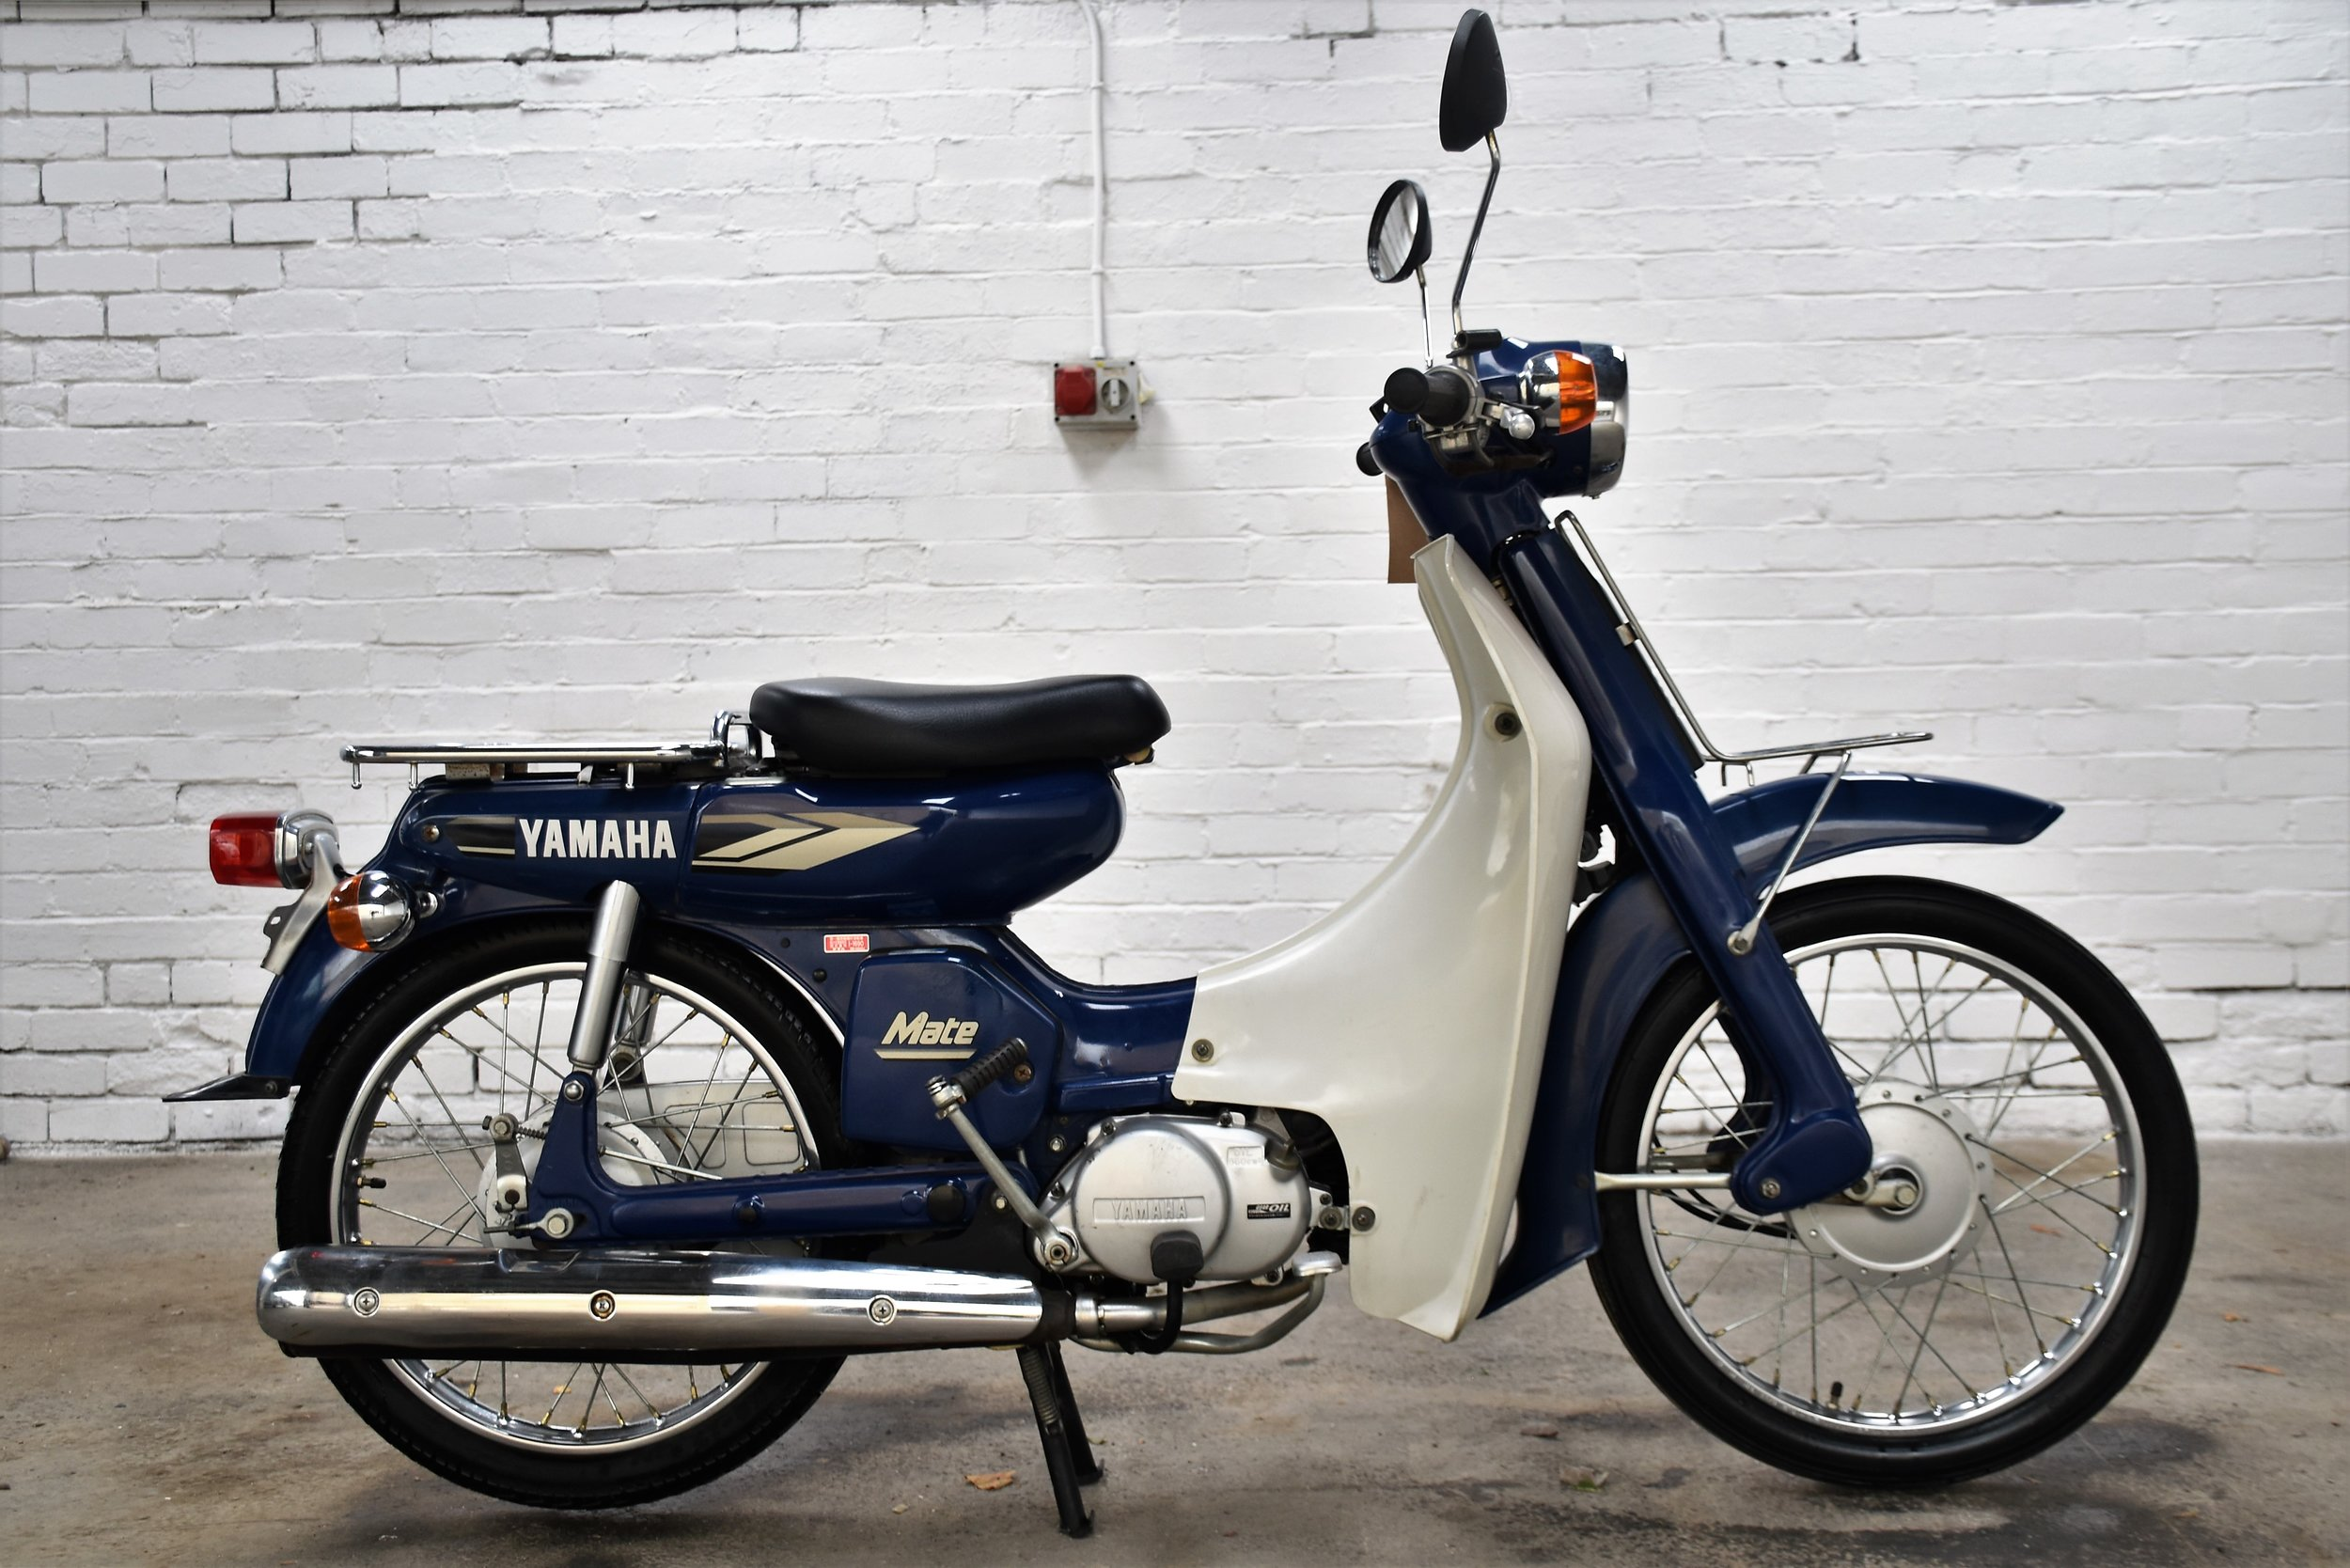 2006 Yamaha New Mate 50 Ref: 9178 £1450